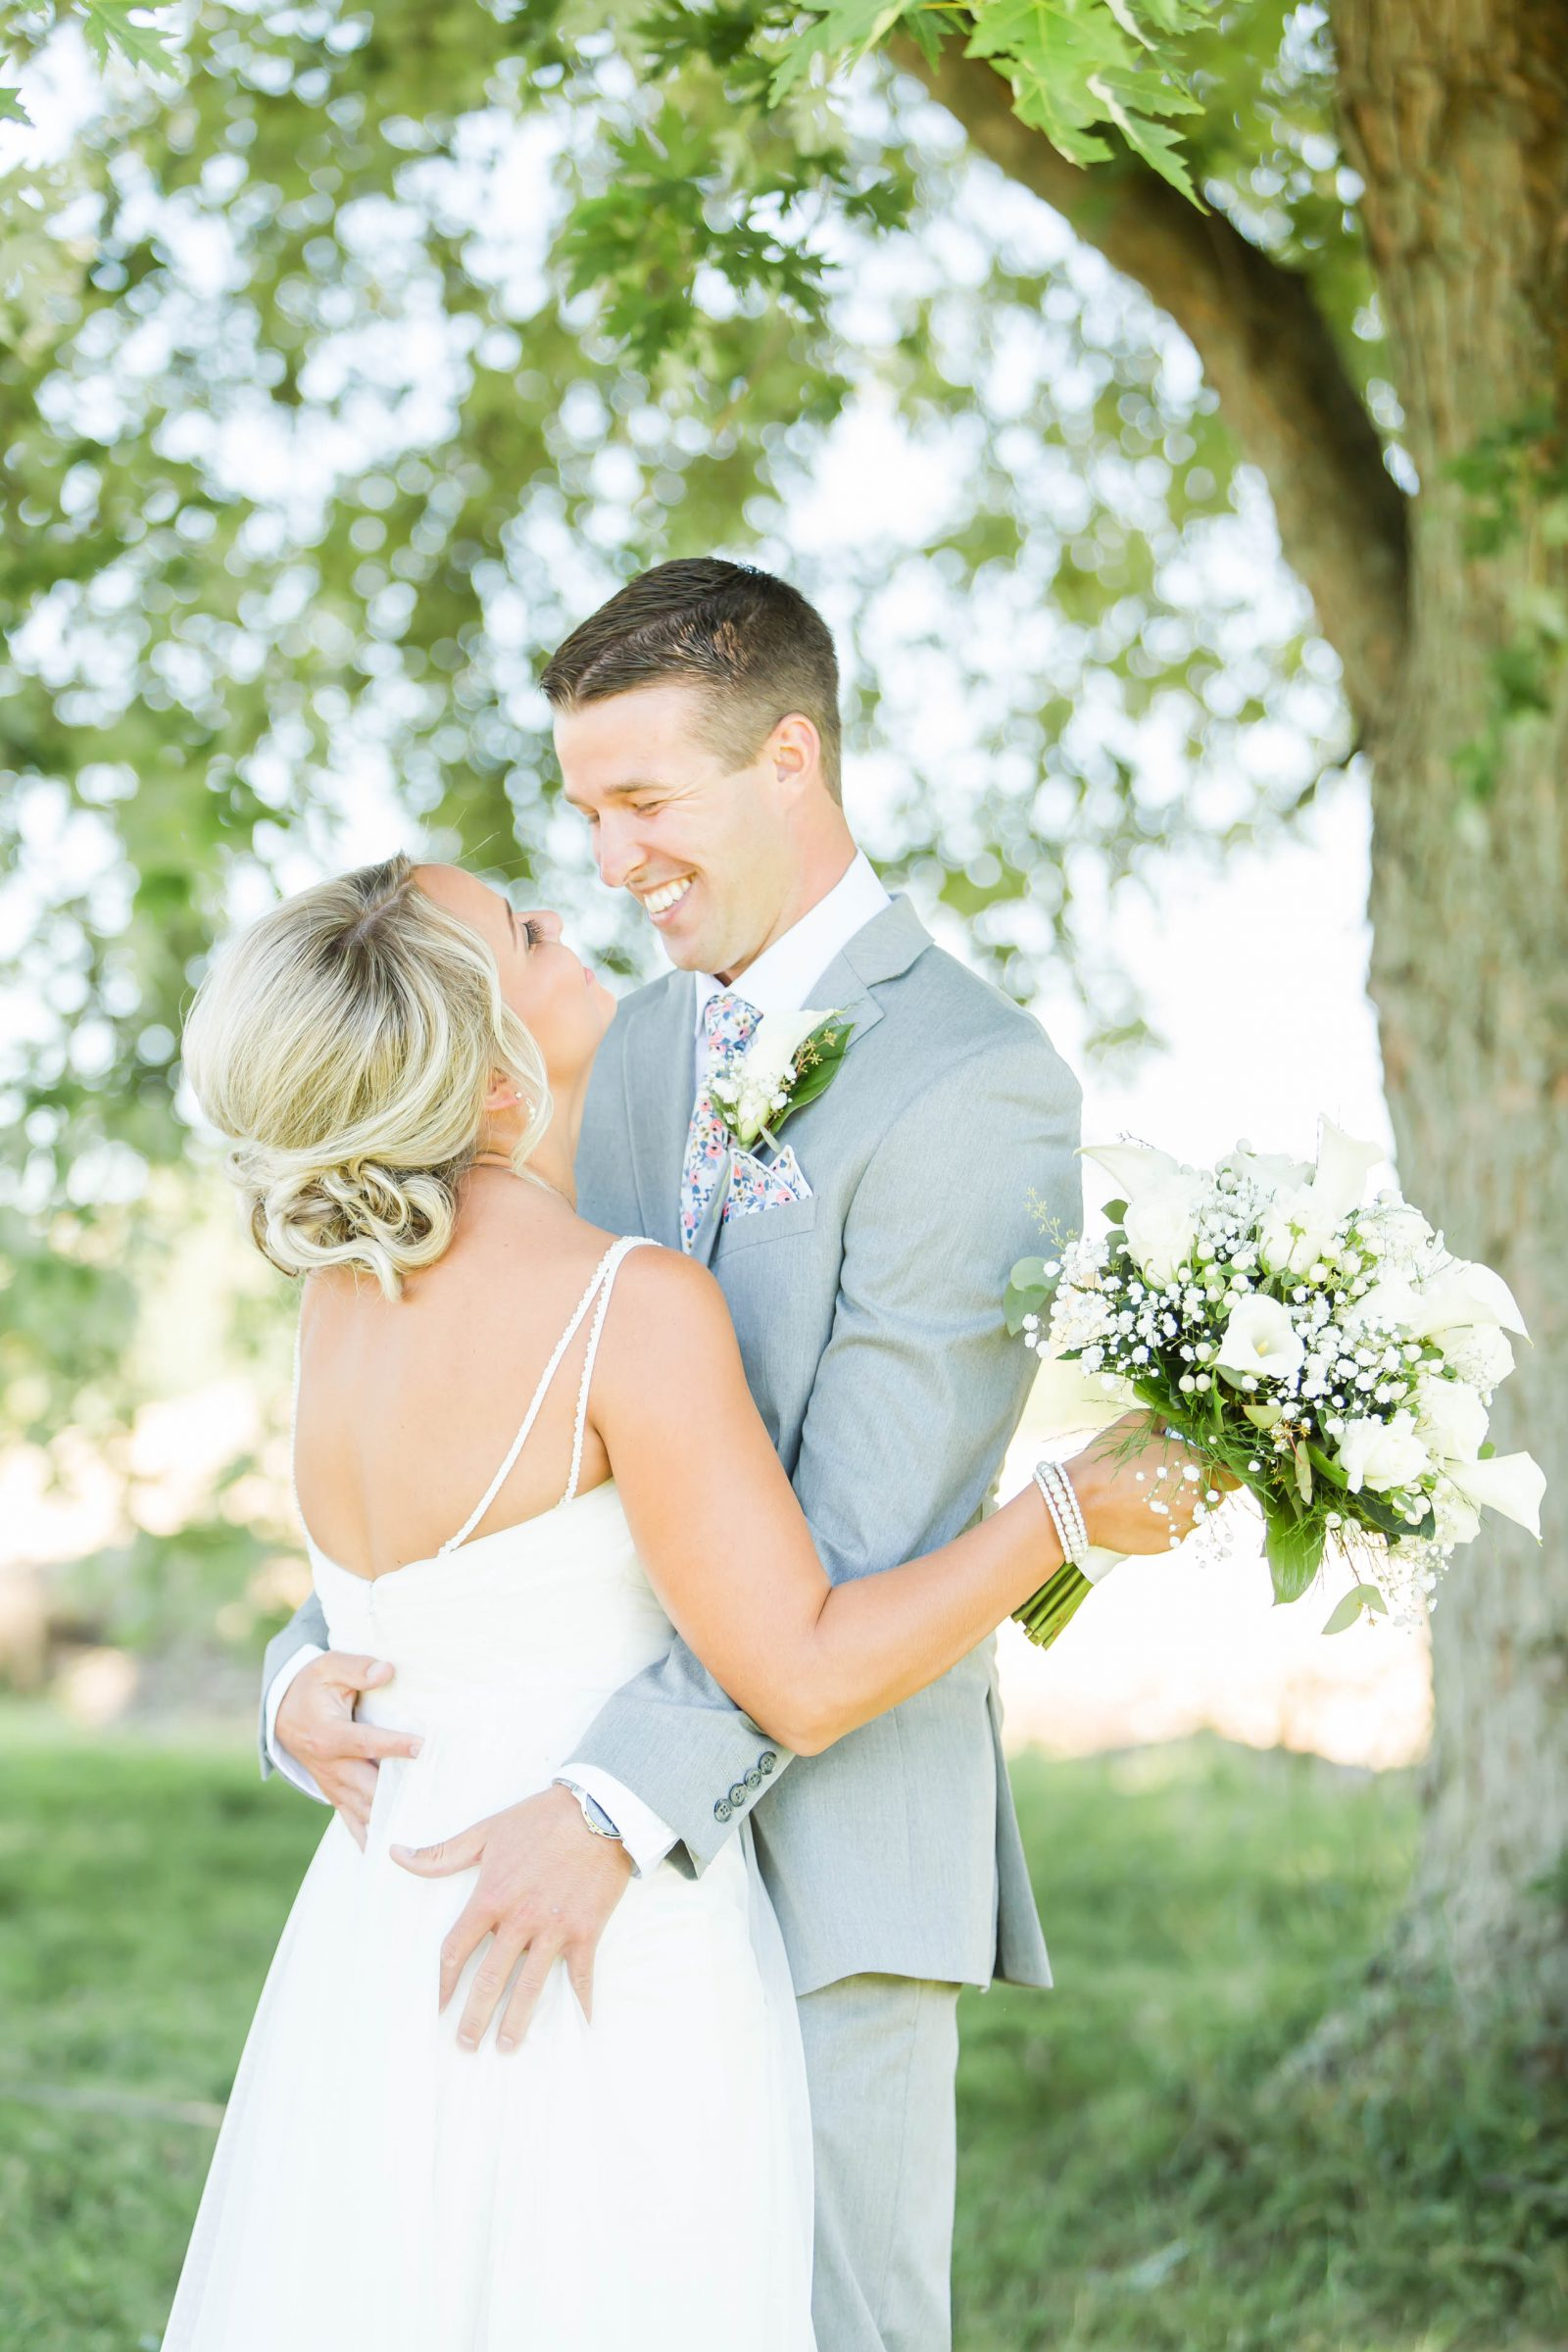 peacock-ridge-summer-wedding-photographer-akron-ohio-loren-jackson-photography-27